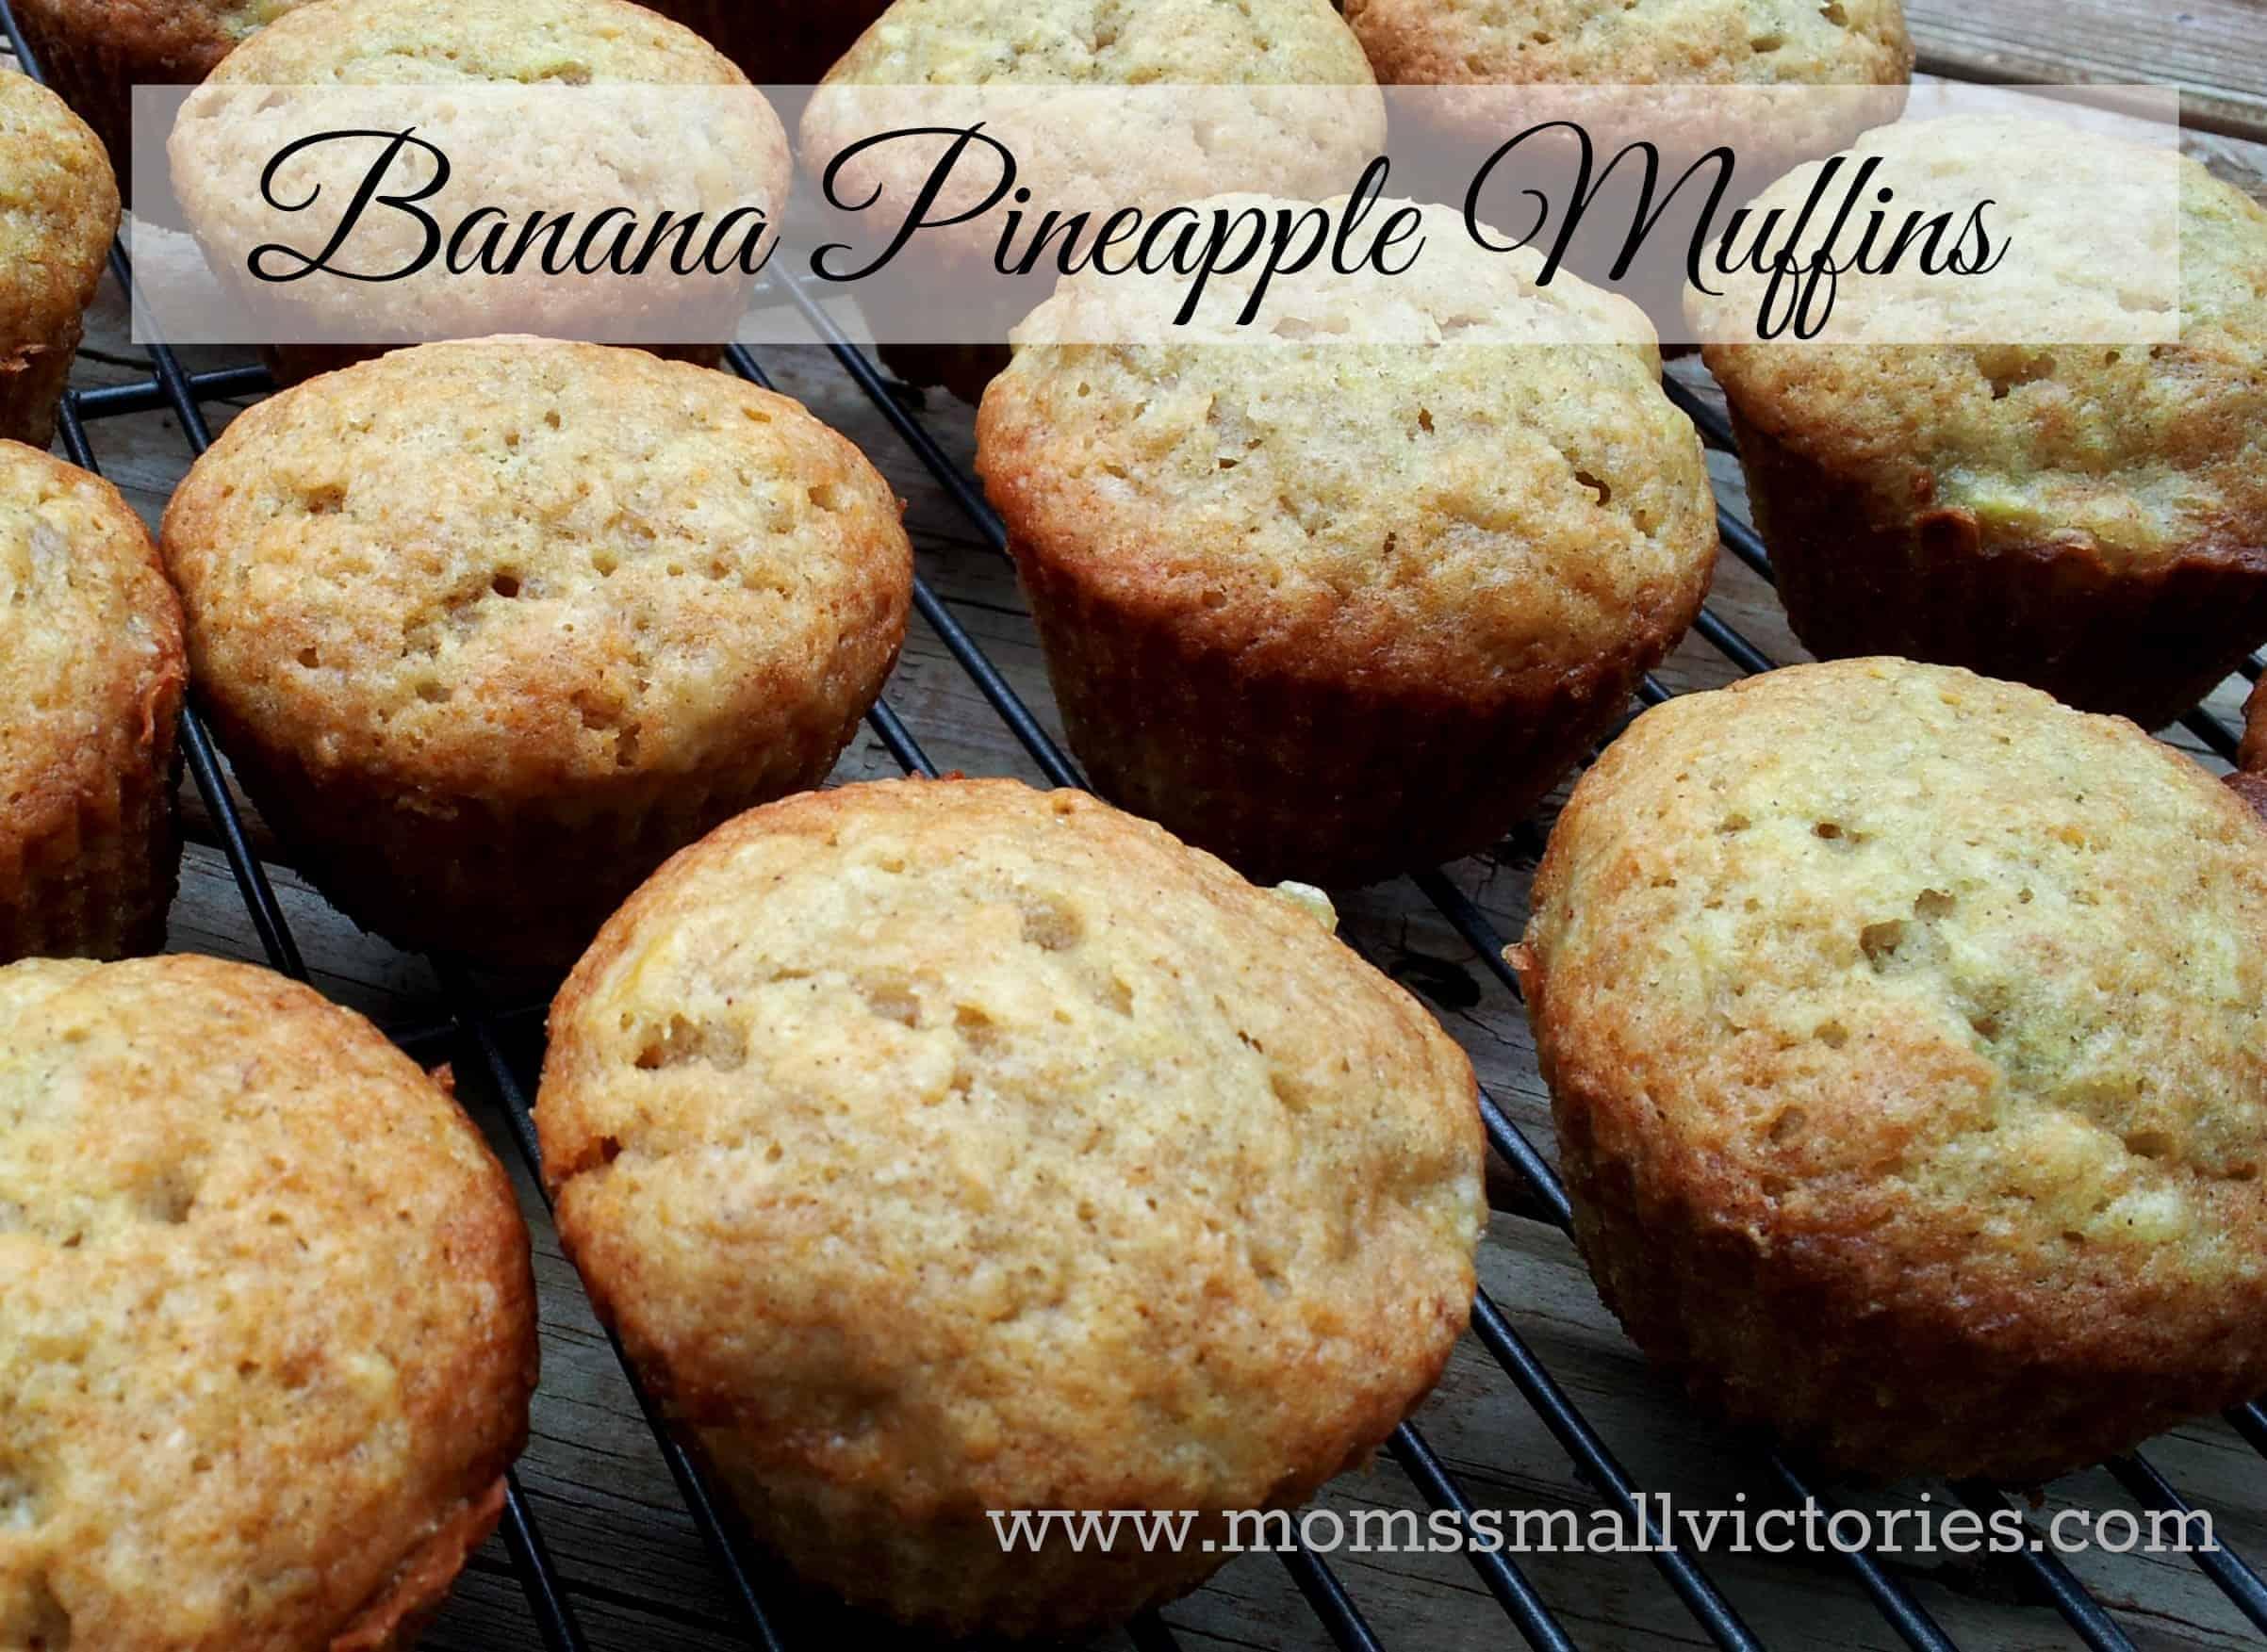 The Best Banana Pineapple Muffins